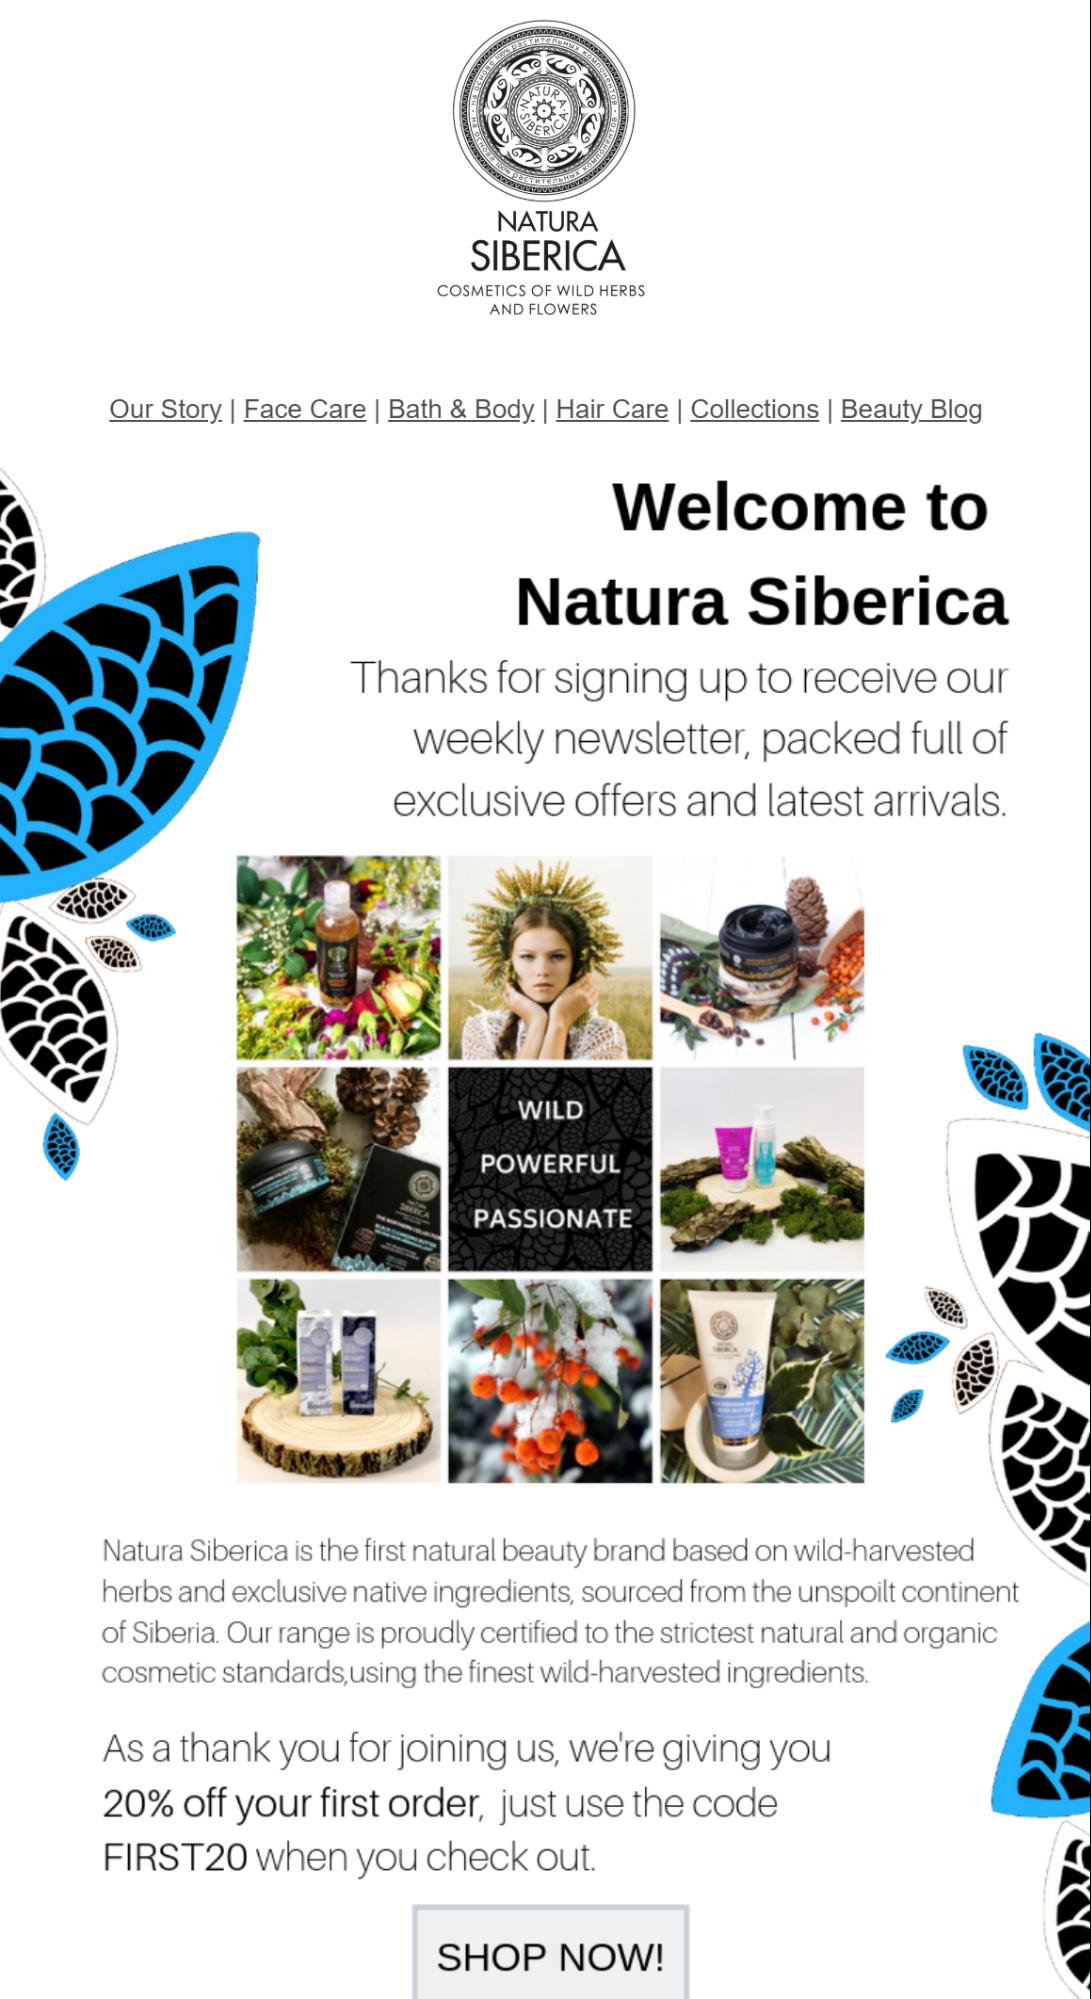 Natura Siberica welcome email marketing